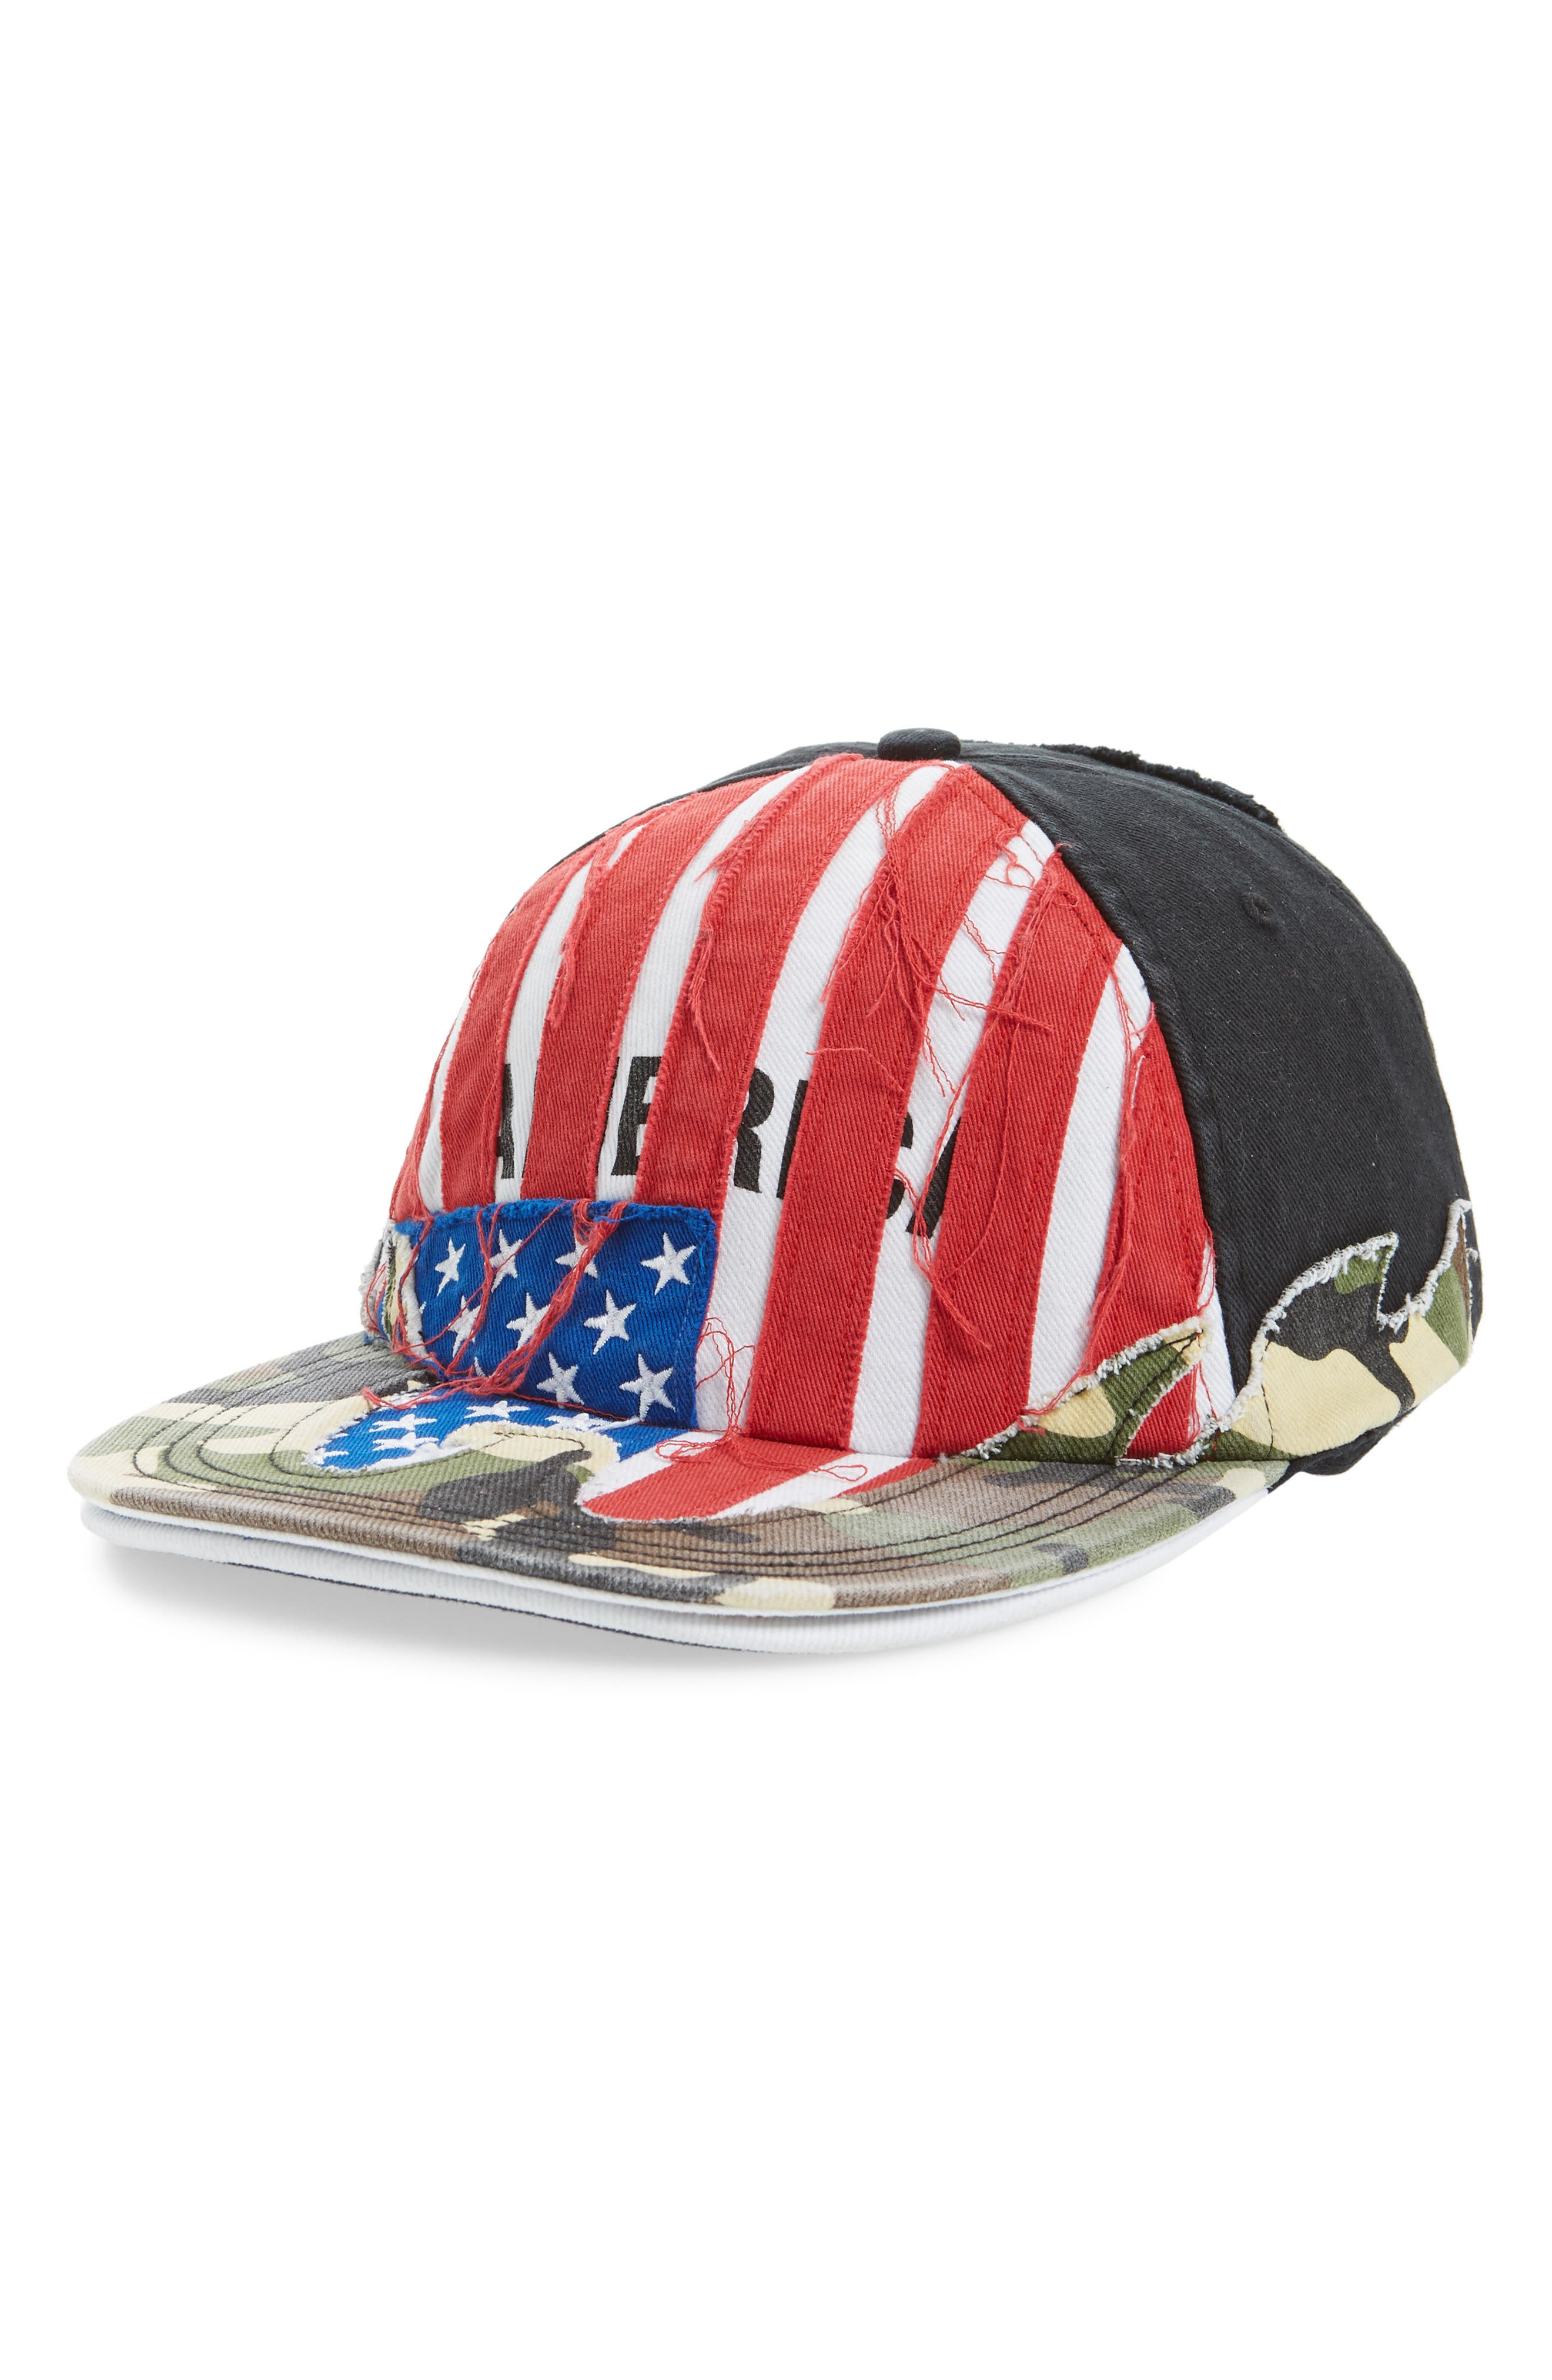 VETEMENTS Cut Up America Baseball Cap, Main, color, USA